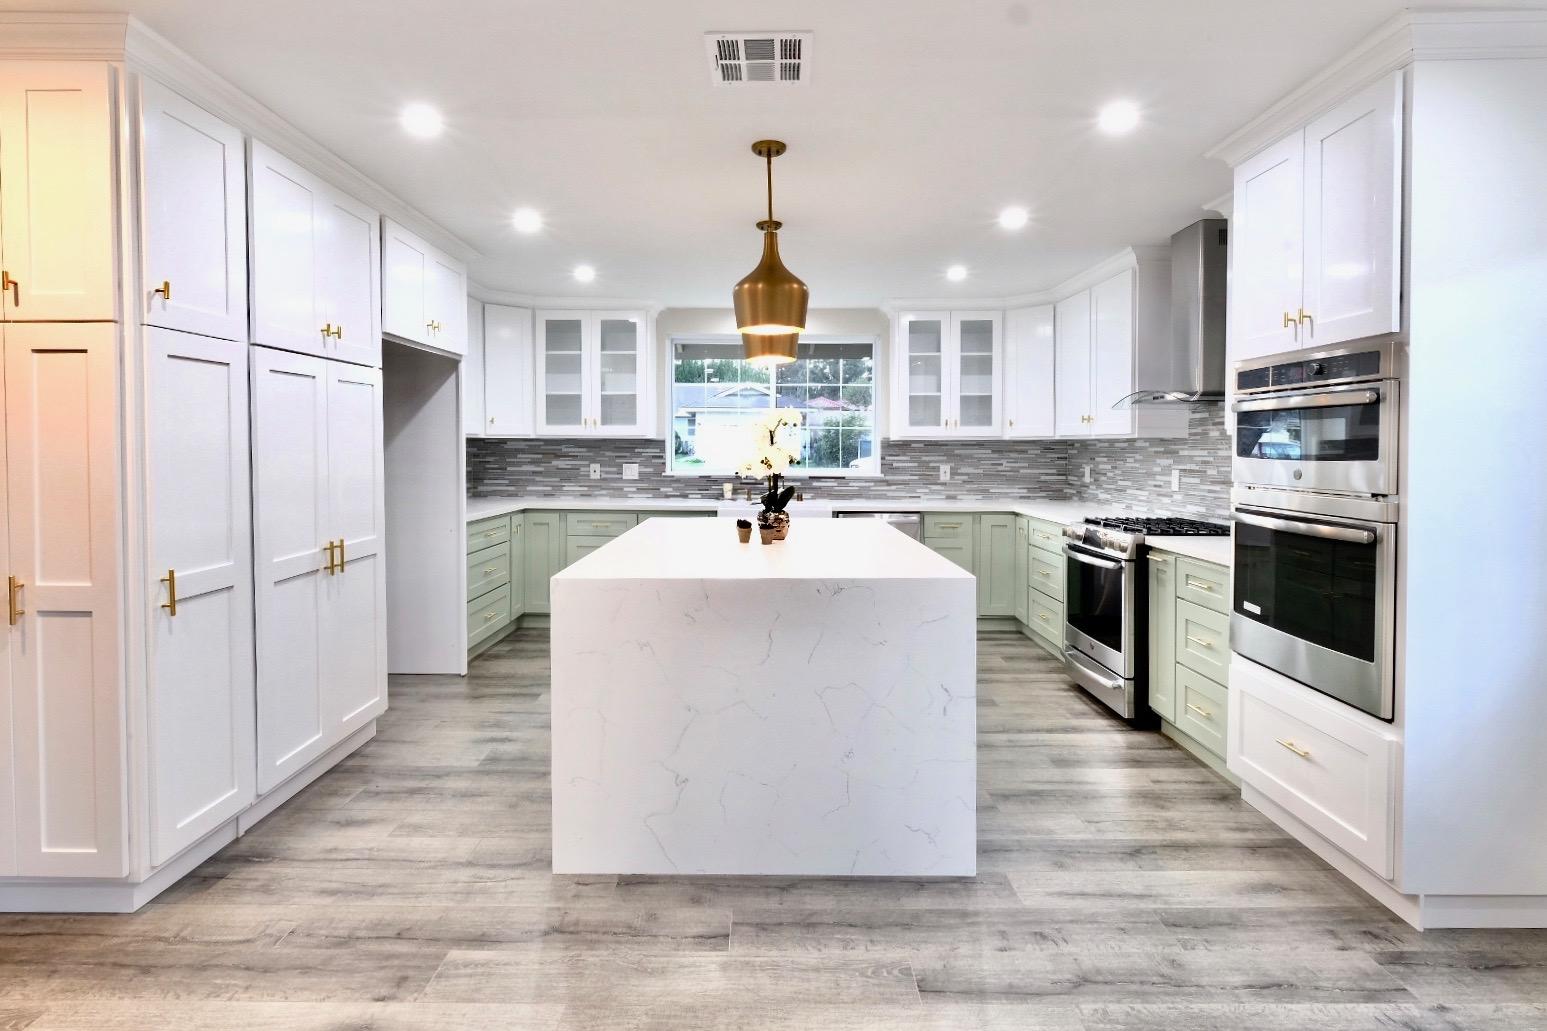 $1.030M - NEW LISTING7922 Bobbyboyar Ave, West Hills, CAElegant. Tasteful. Expansive open floor plan w/pool.